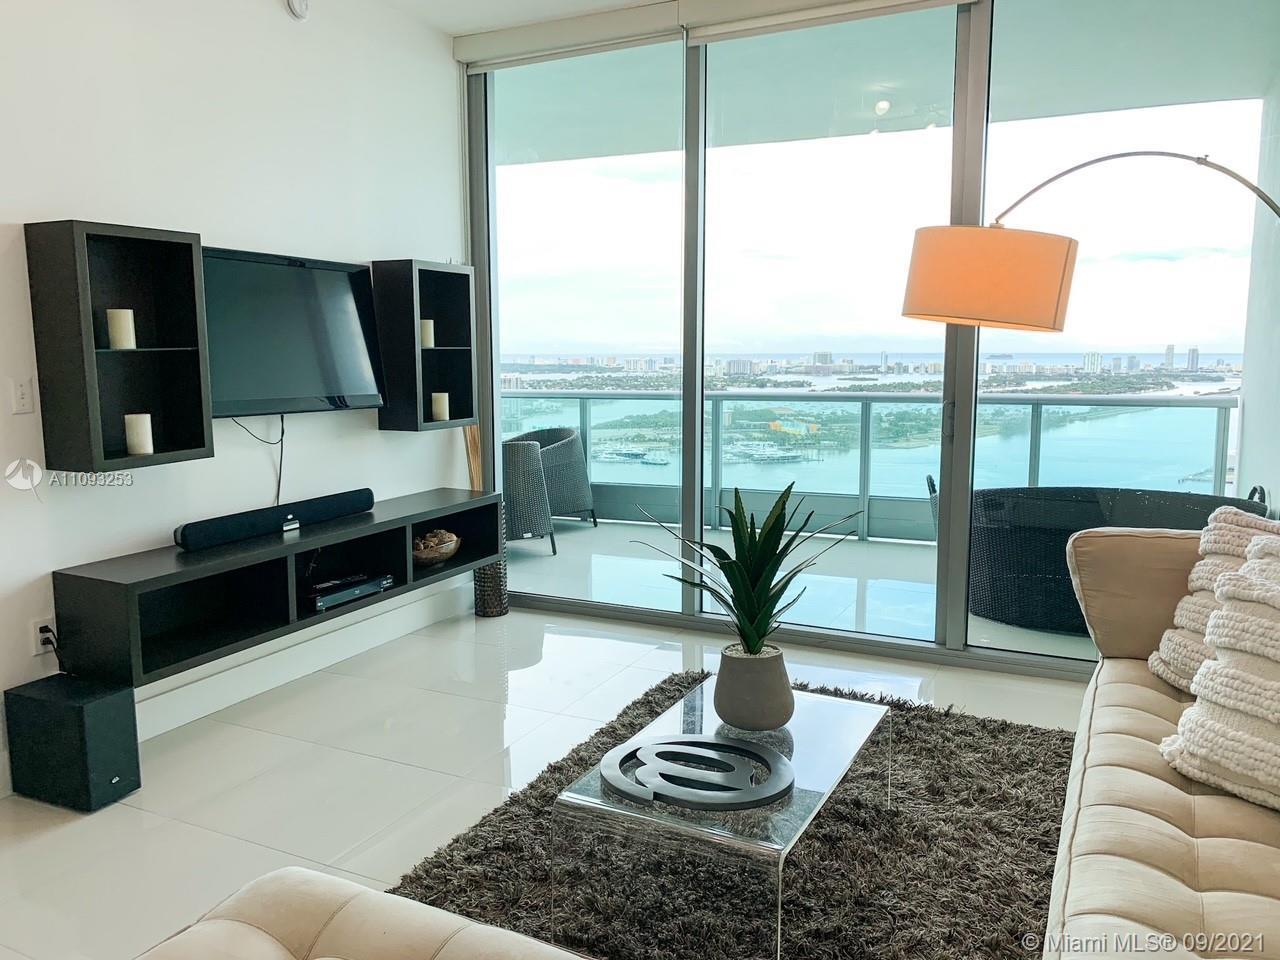 Stunning 180 degree views of Biscayne Bay, Atlantic Ocean & Miami Skyline.This is 1 Bedroom plus Den